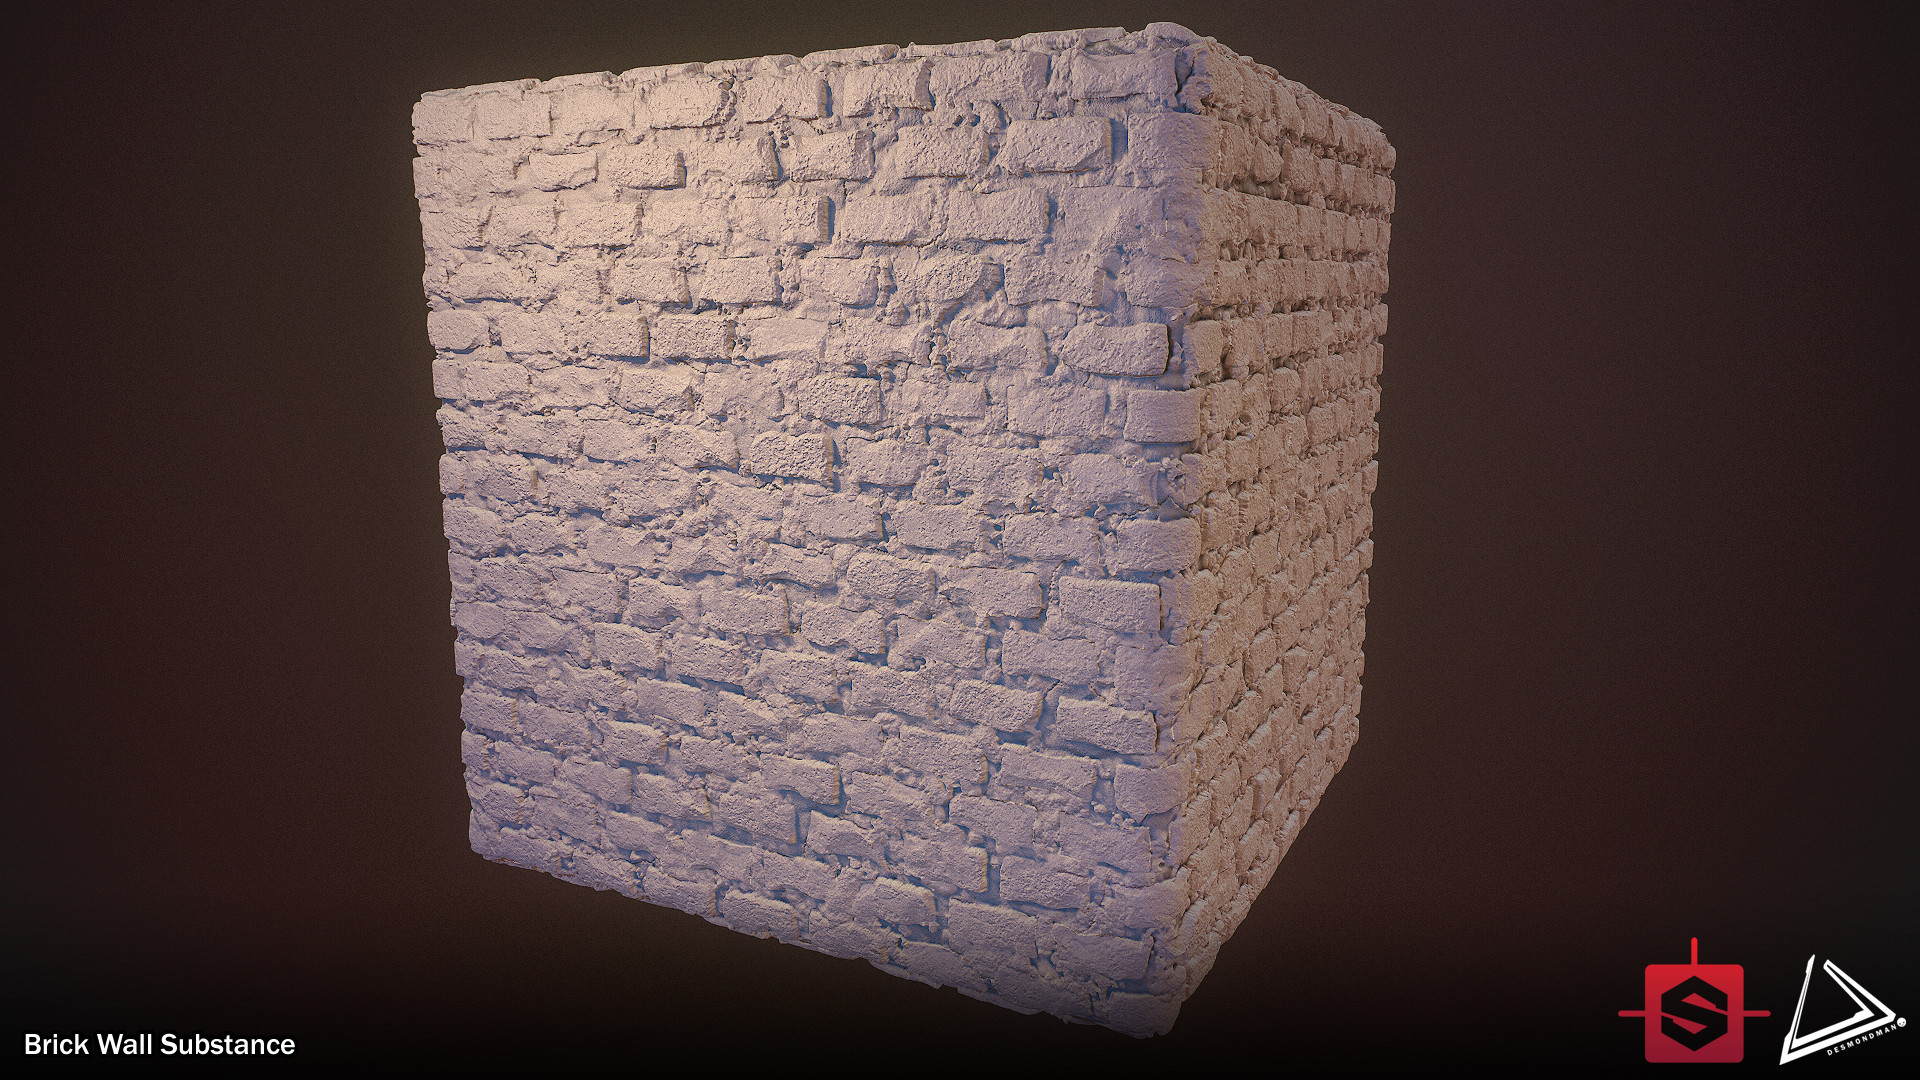 Desmond man sbwc brickwall01 showcase02